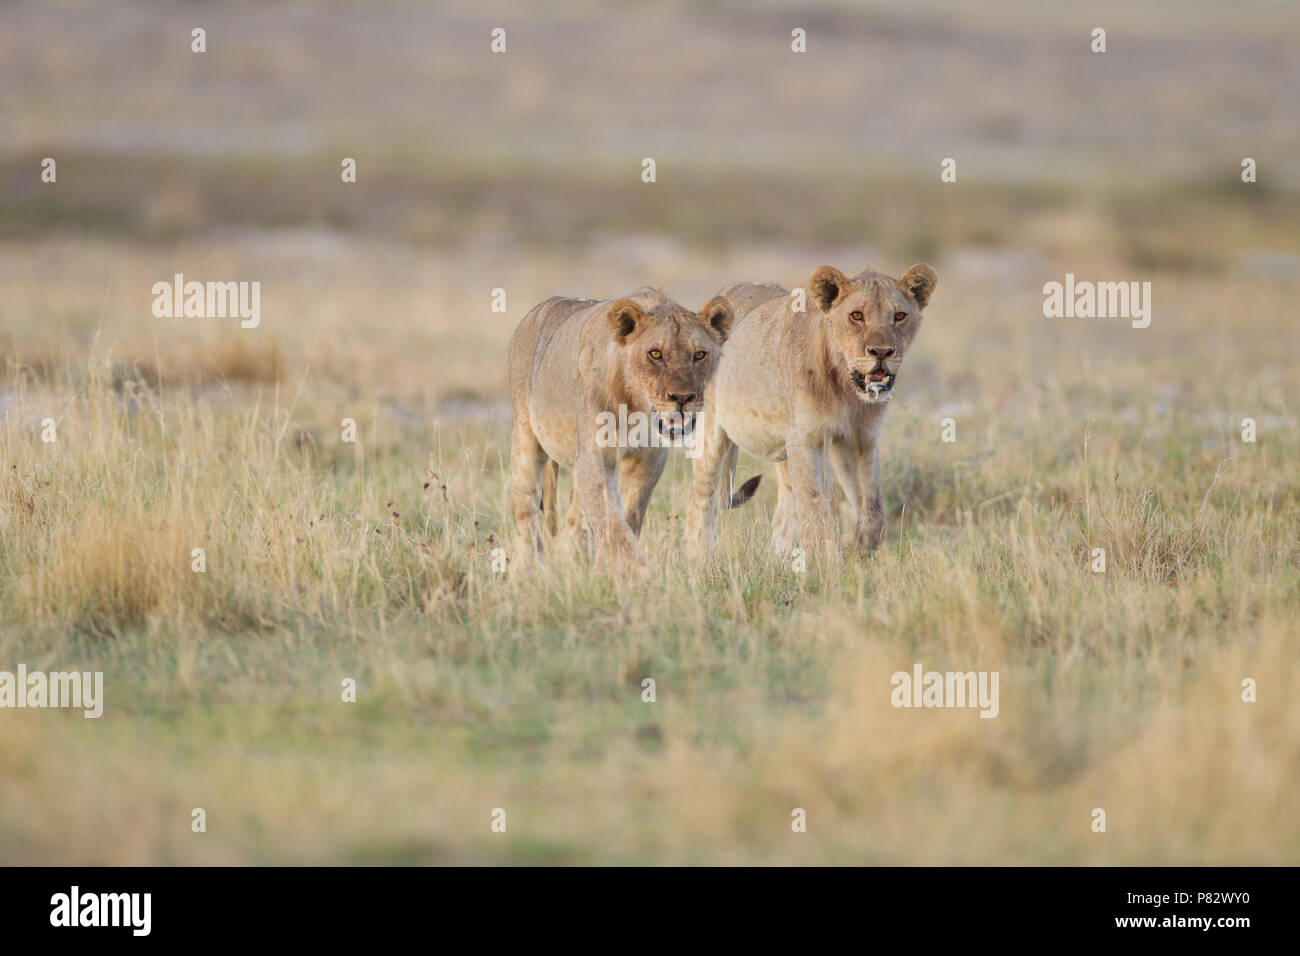 Two juvenile desert Kalahari lions patrolling the area - Stock Image